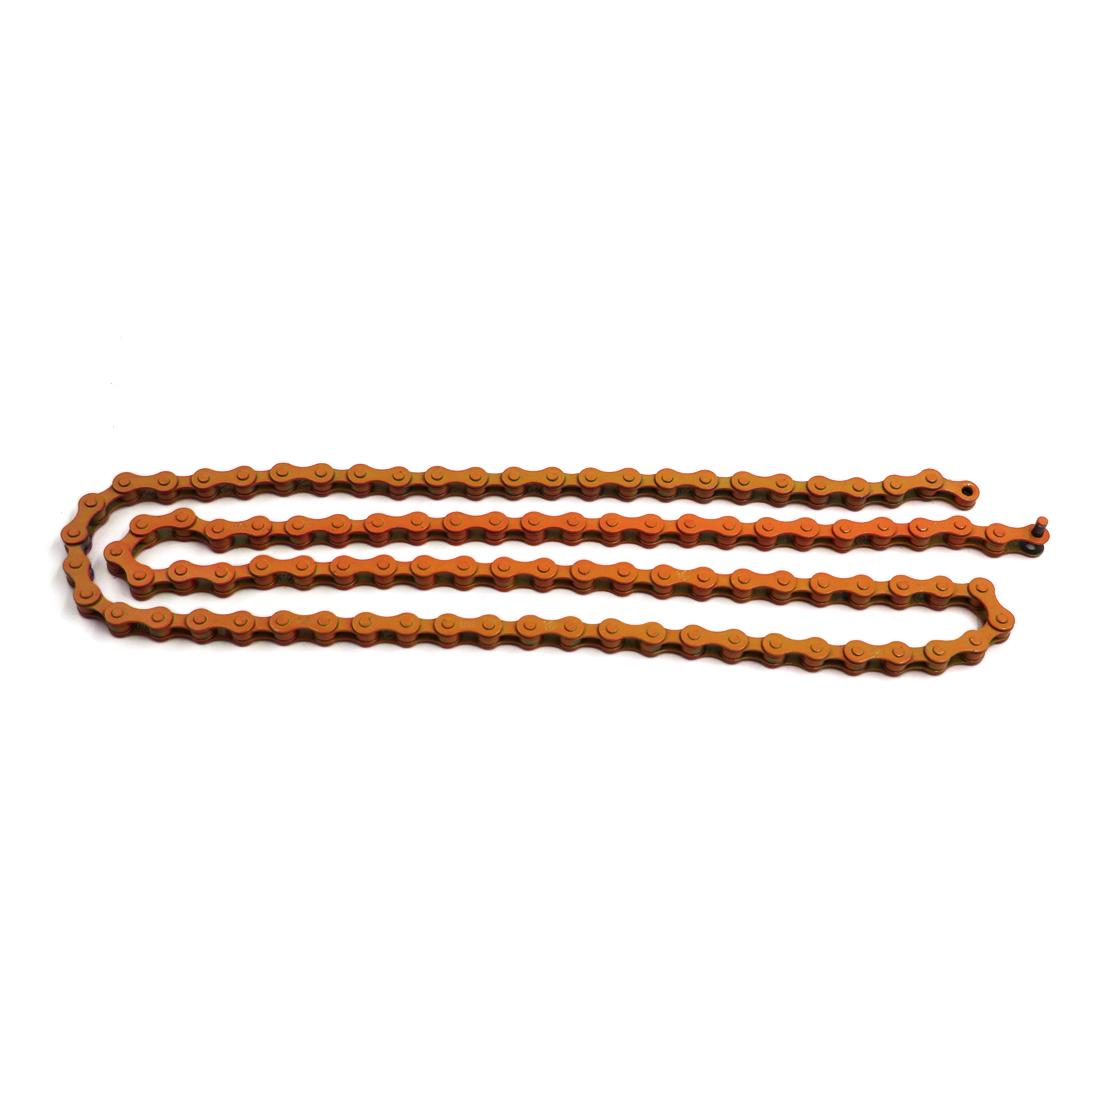 122cm Length 96 Links Speed Bike Bicycle Cycling Metal Chain Orange